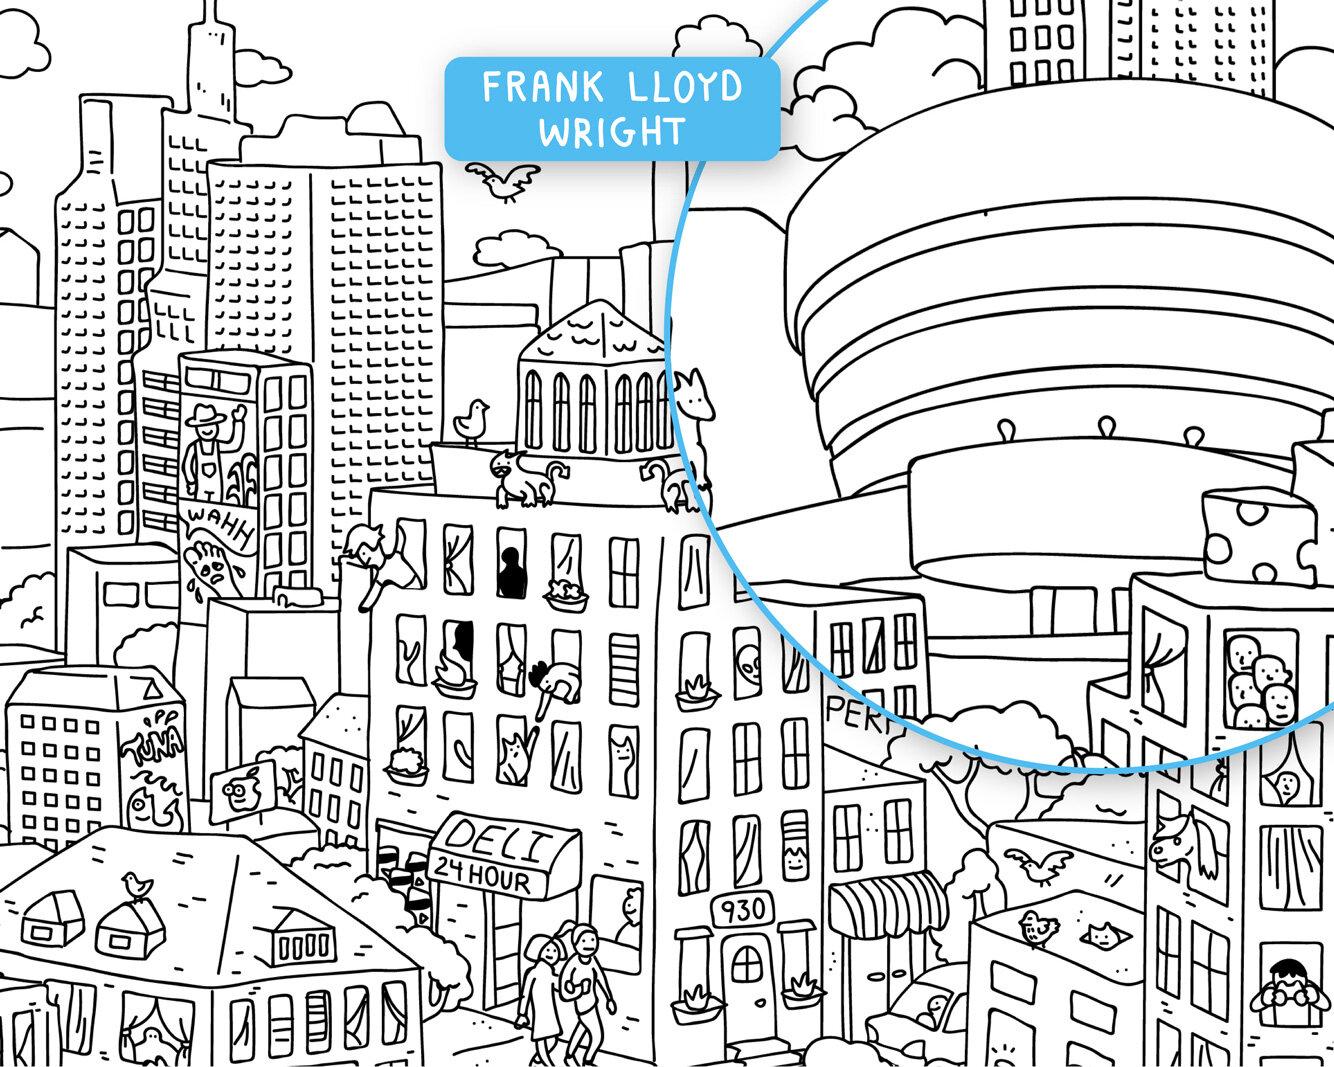 FindFrank-Highlights_FrankLLoydWright.jpg